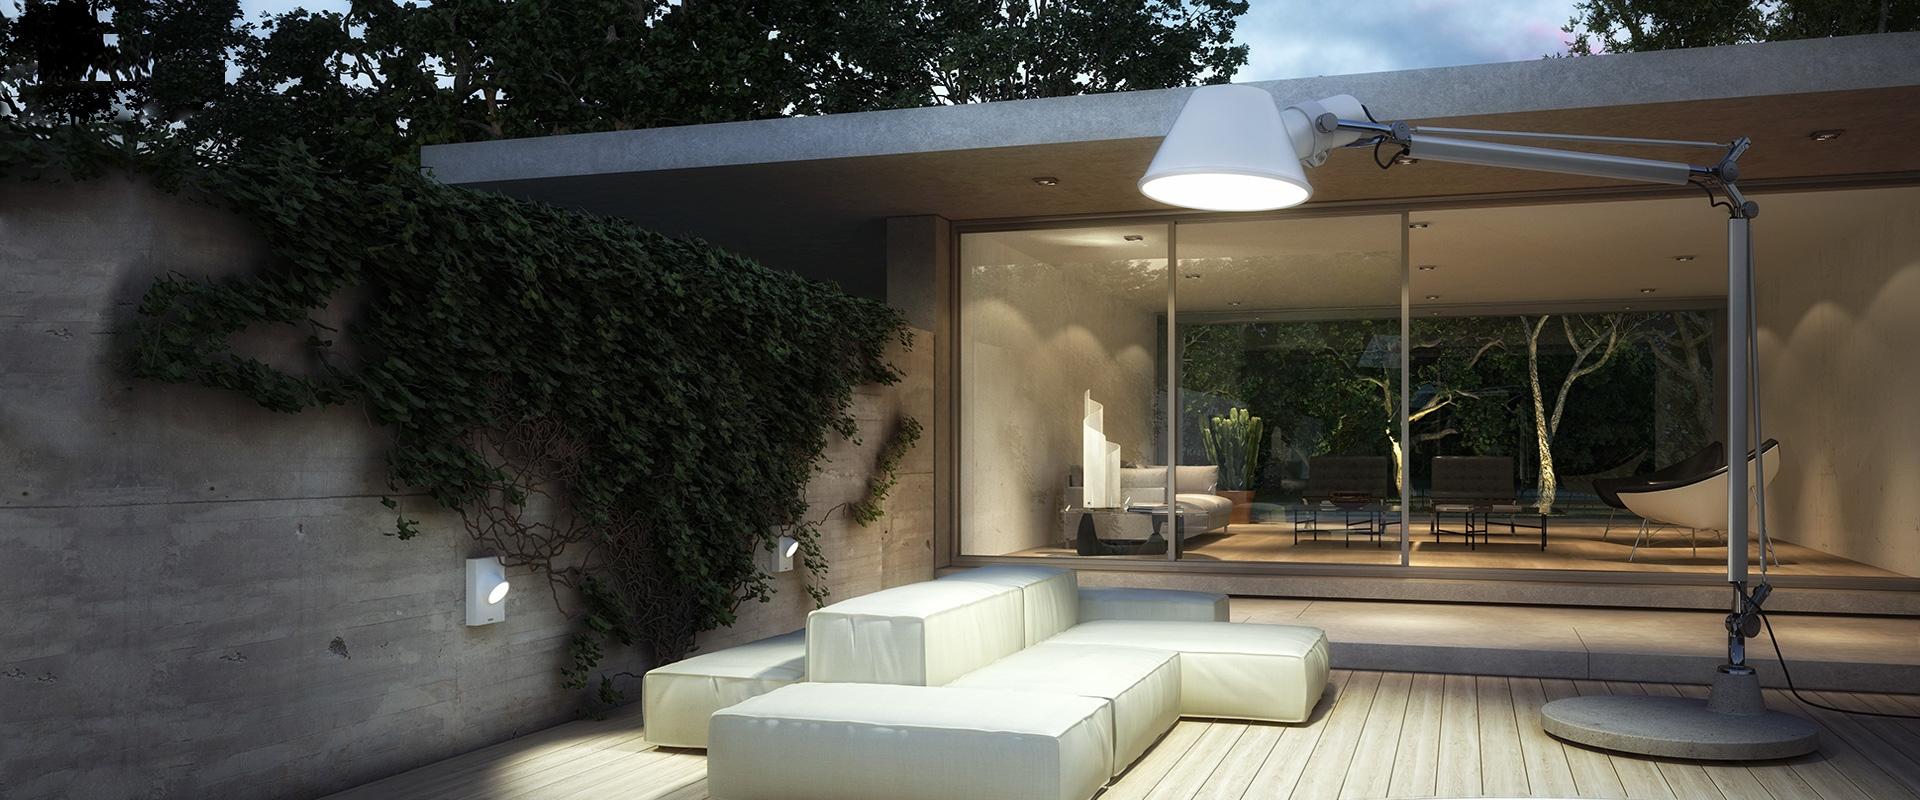 Obegi Home Artemide Outdoor Lamp Tolomeo